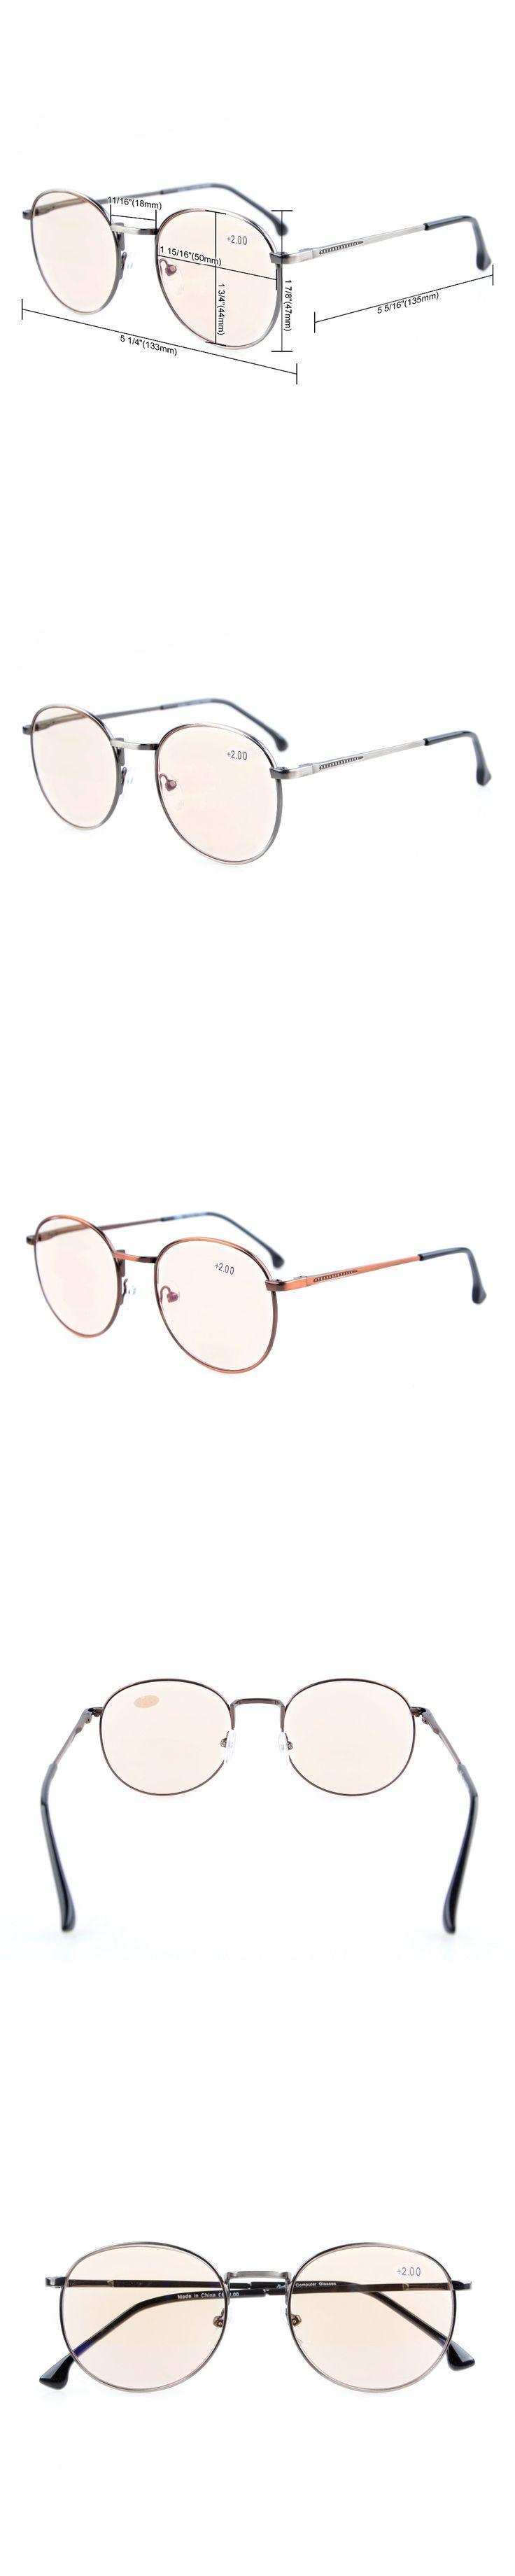 CG1619 Eyekepper Anti Glare Glasses Amber Tinted Lenses Computer Reading Glasses Quality Spring Hinges Large Round Retro Glasses